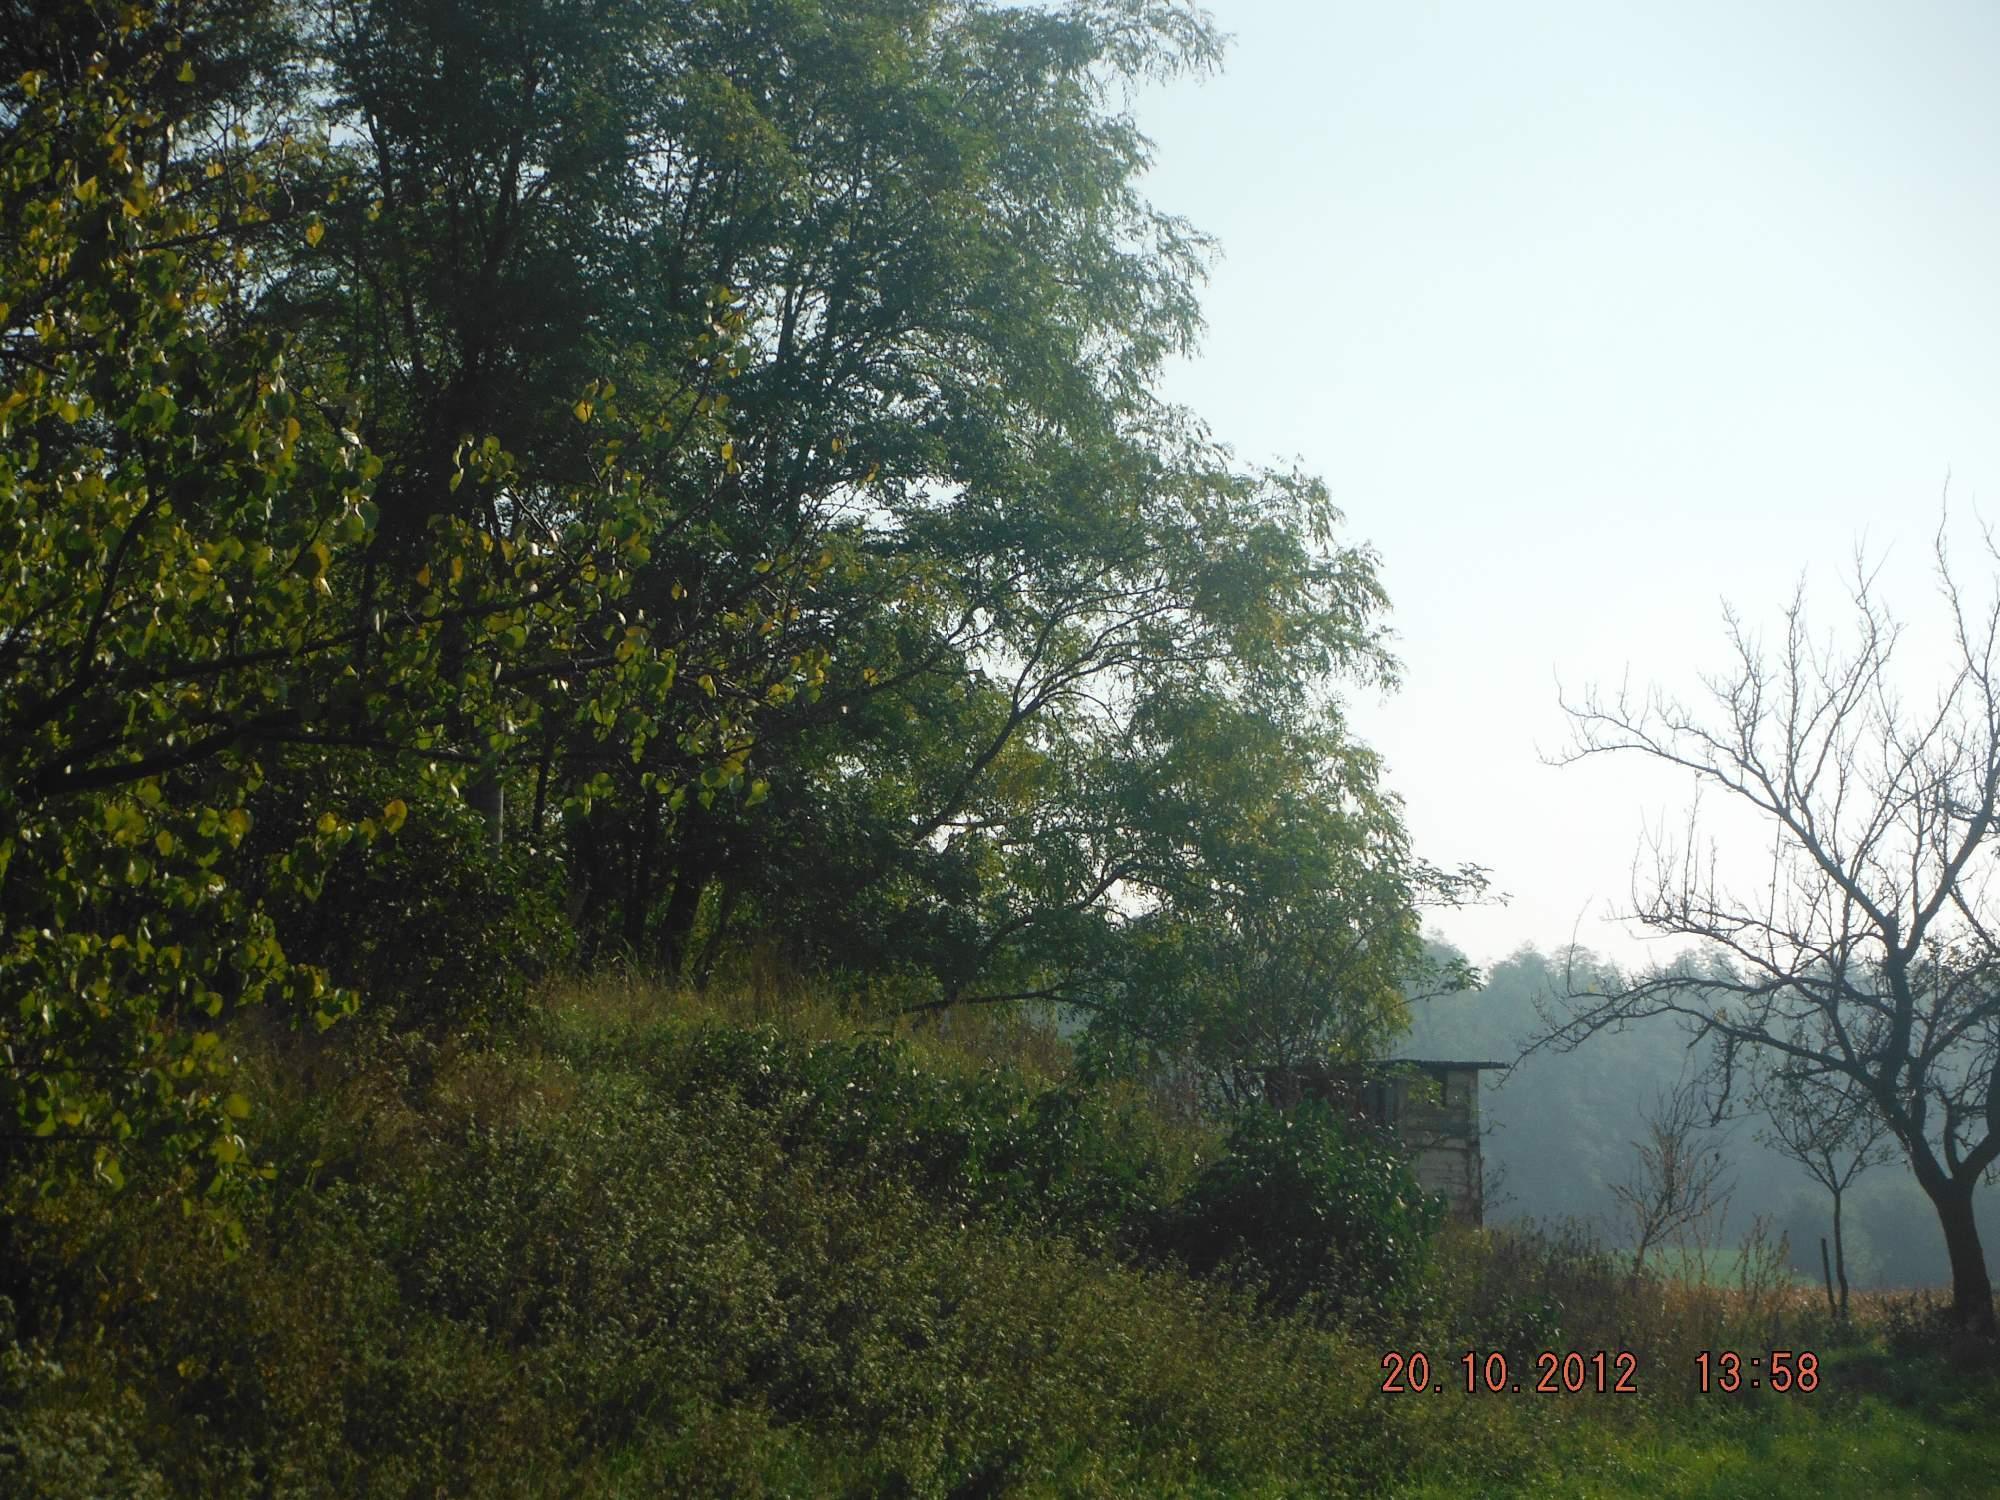 http://img24.rajce.idnes.cz/d2403/13/13214/13214242_a1e43f49e51a1daa7632f800d4edae3f/images/SAE626.jpg